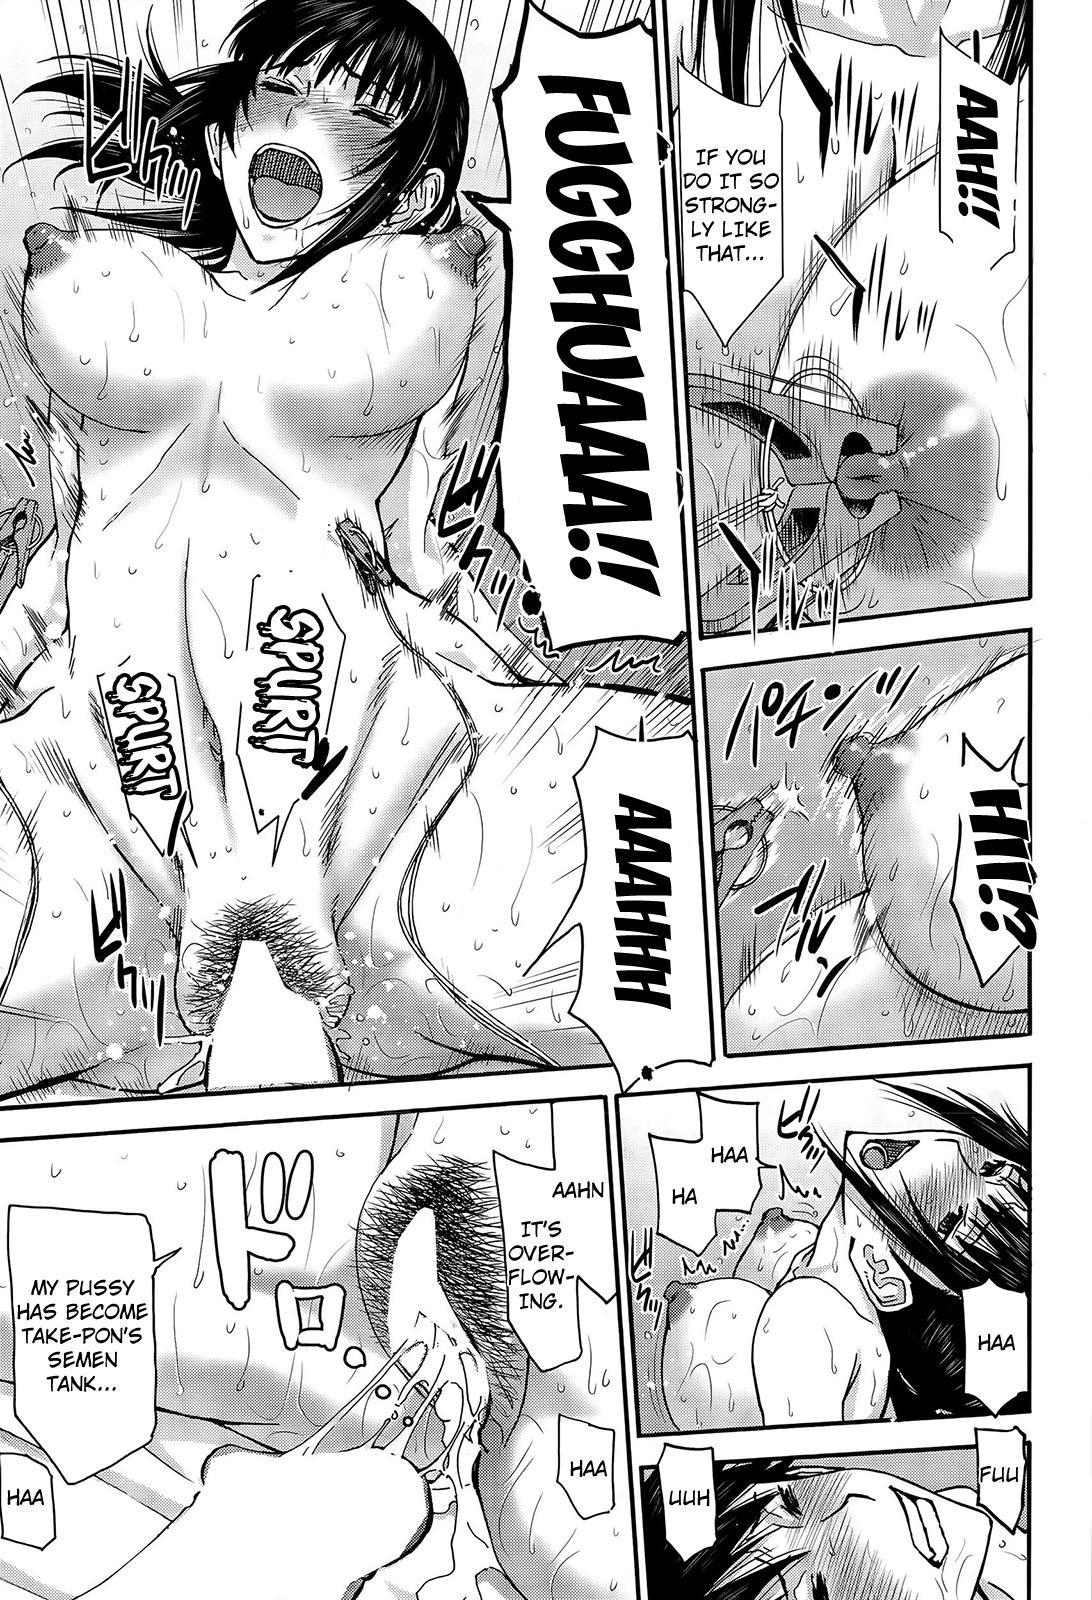 Boku to Itoko no 7-kakan Sex | Seven Days of Sex with Cousin 8